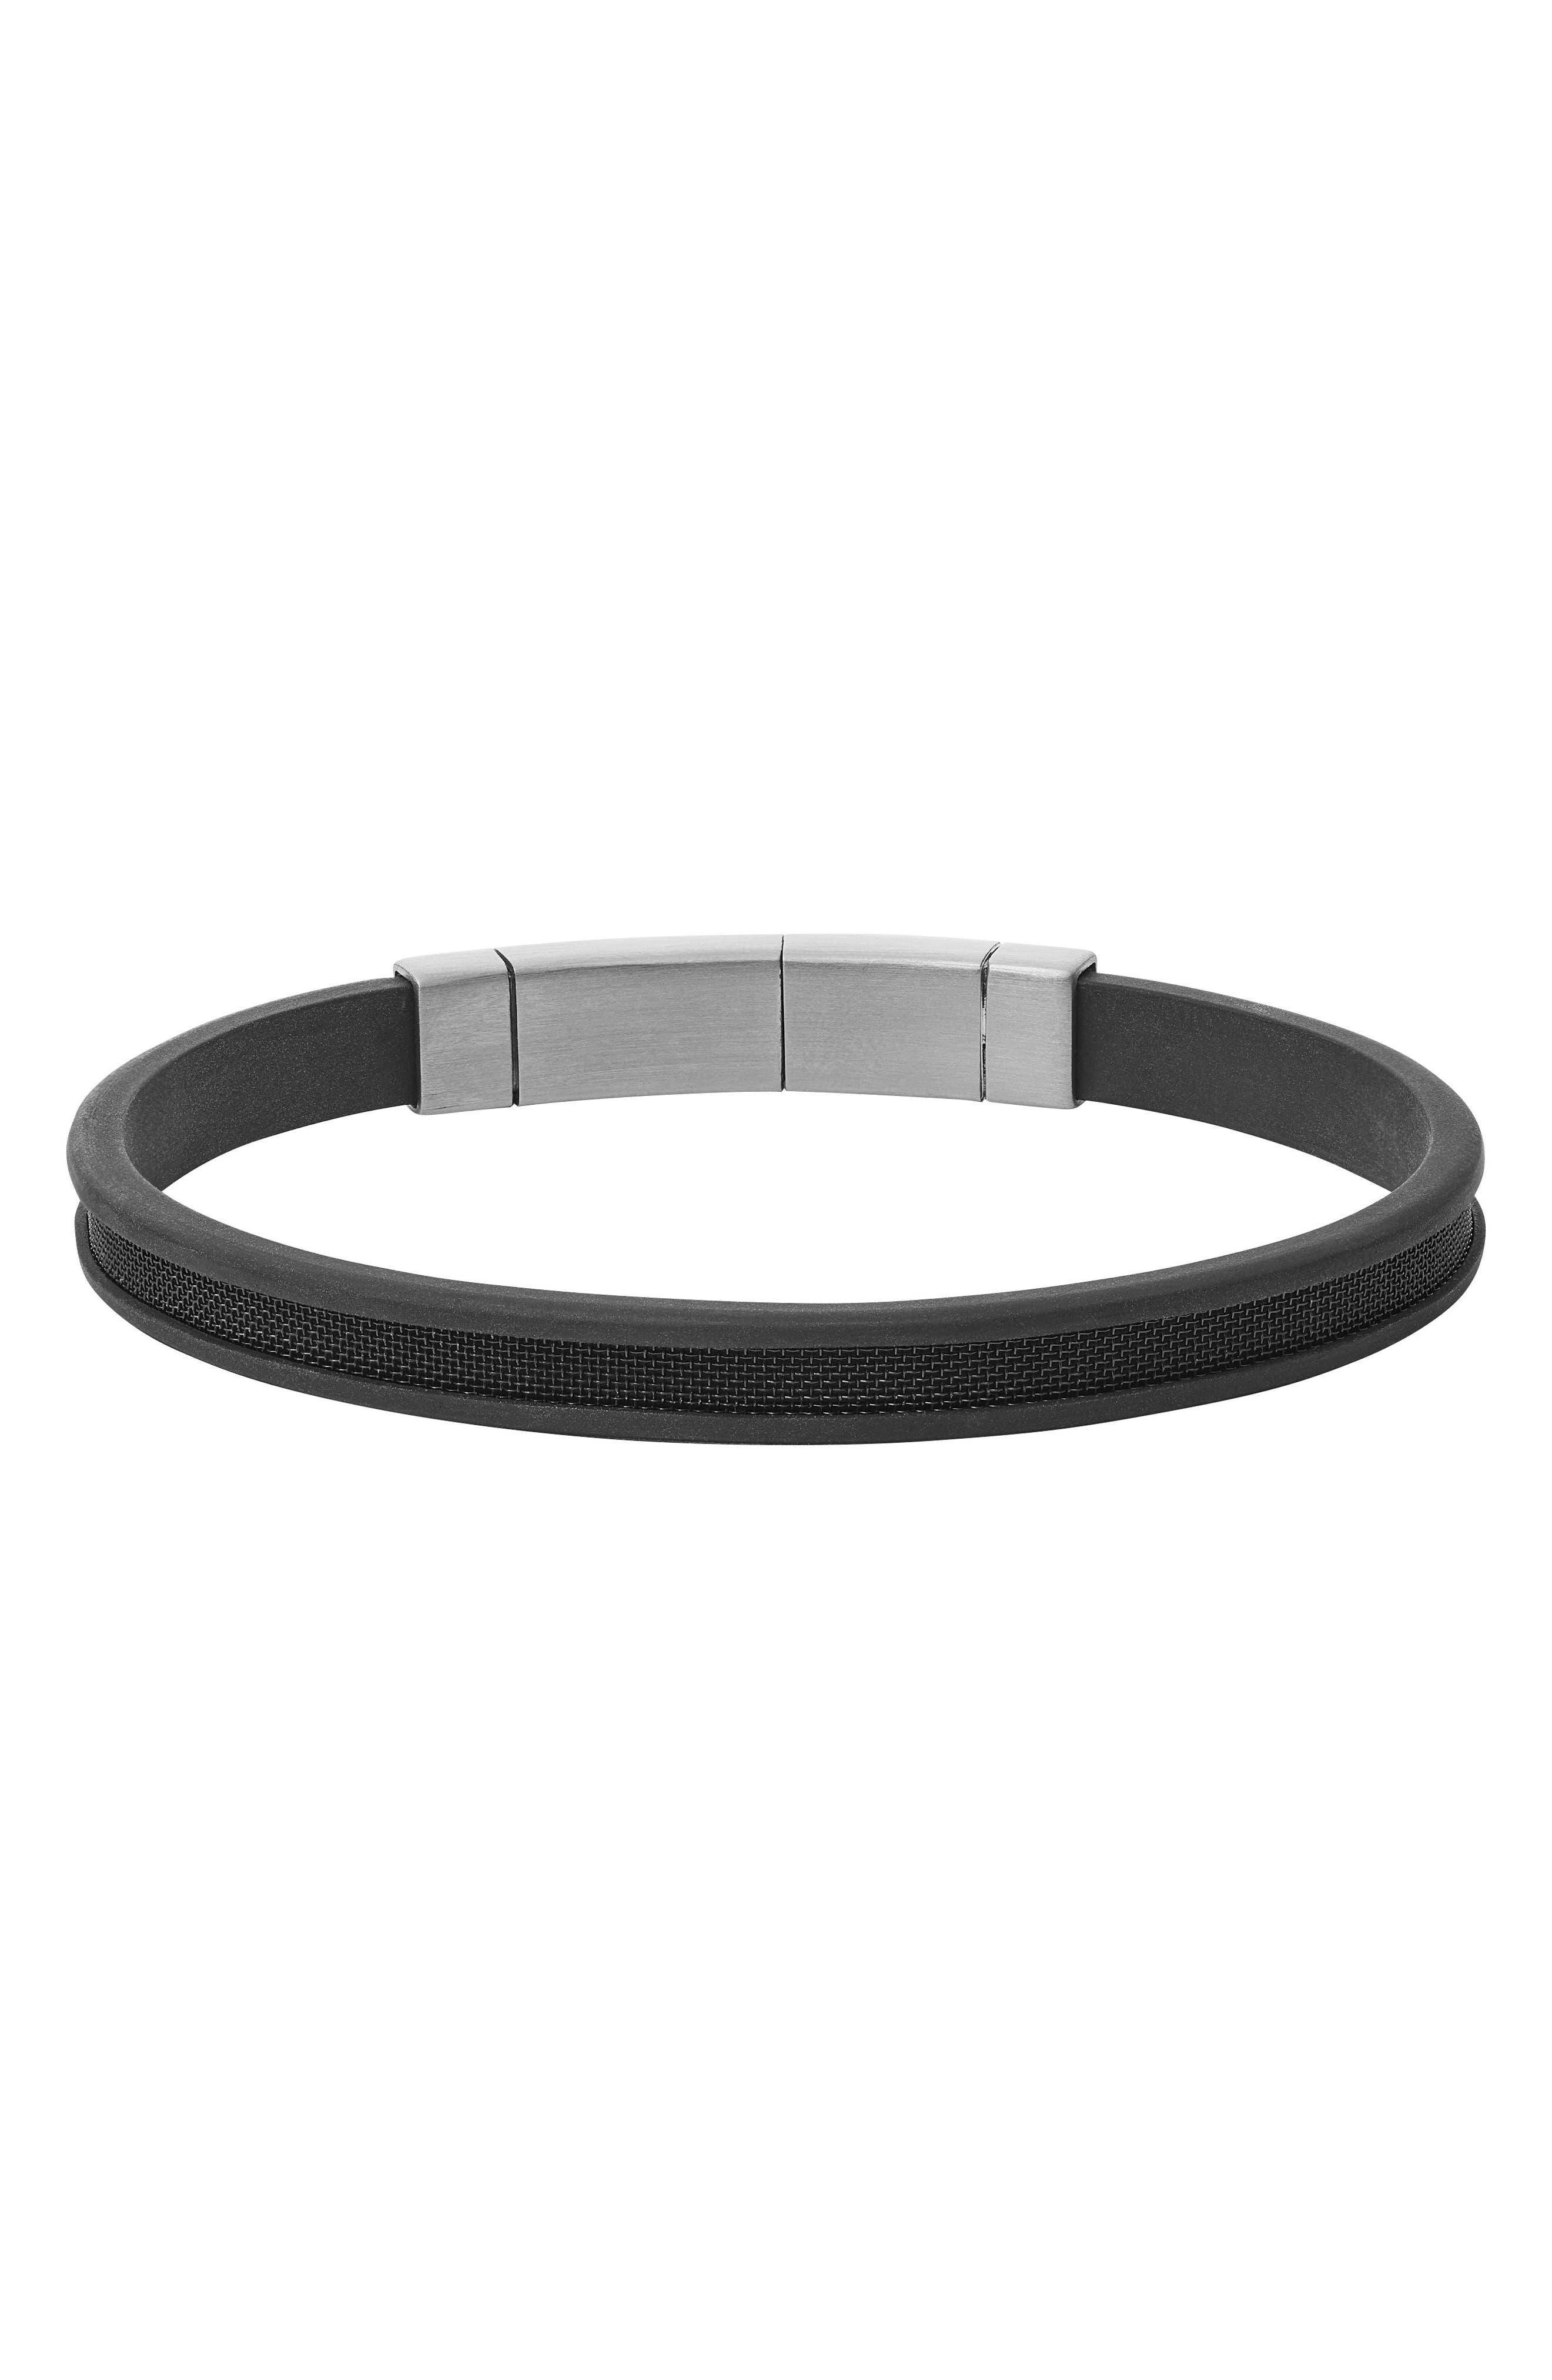 Kring Bracelet,                             Main thumbnail 1, color,                             018